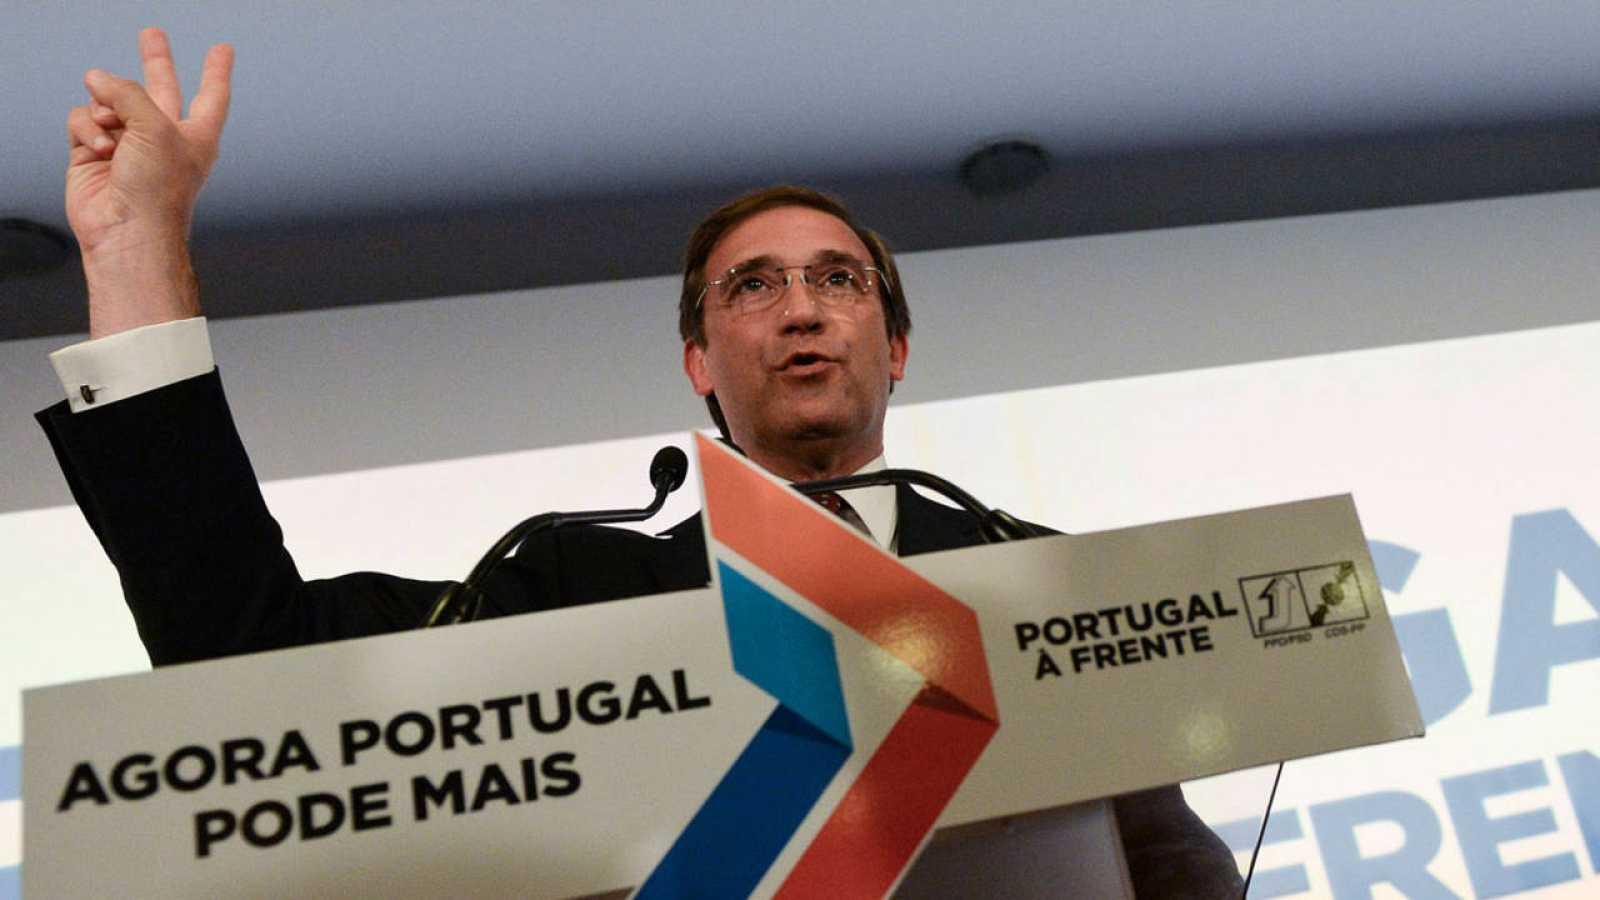 El actual primer ministro portugiés y líder del Partido Socialdemócrata portugués (PSD), Pedro Passos Coelho.